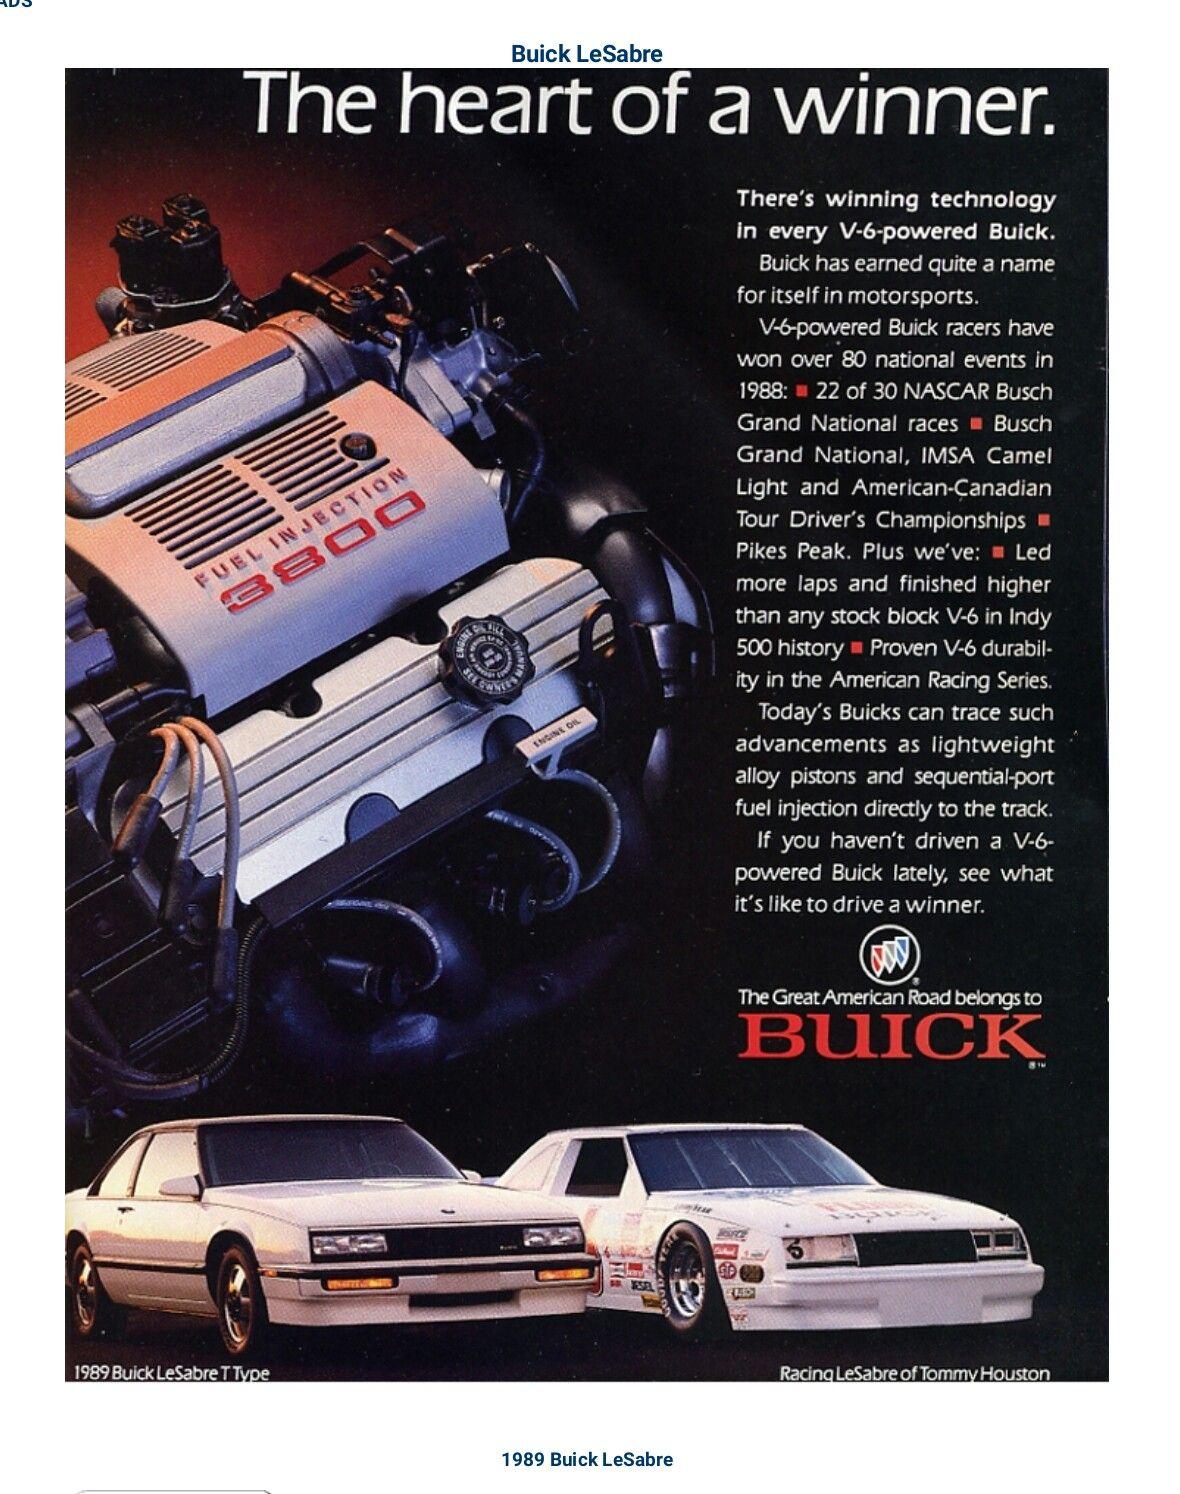 Bmw M3 Racing Retro 1989 Reproduction Garage Man Cave Sign